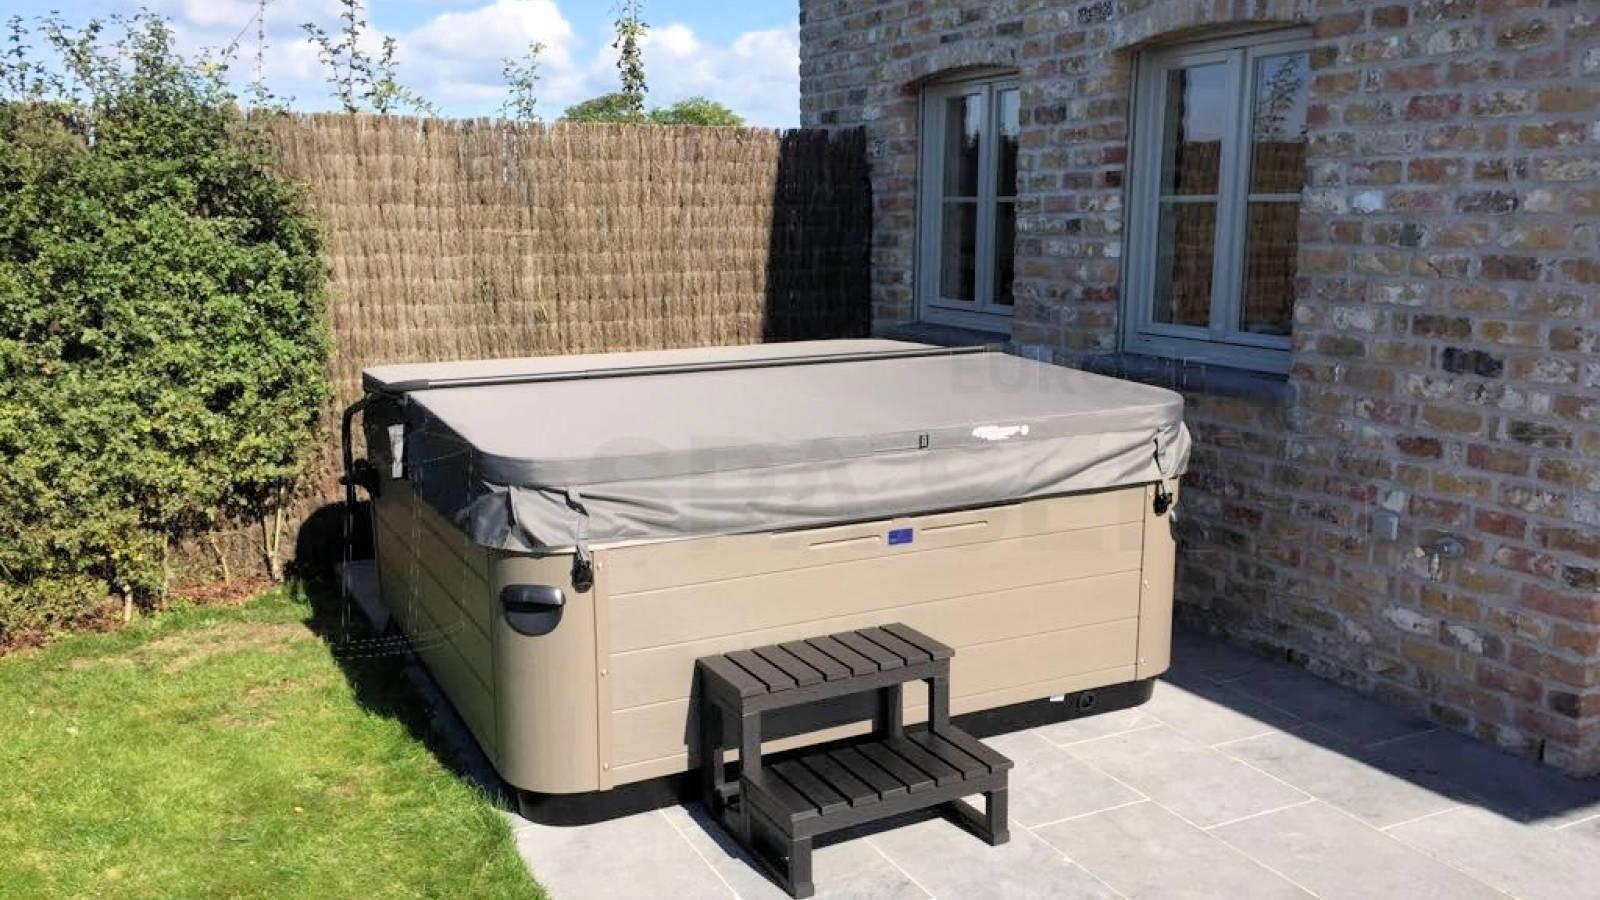 Plaatsing van een Villeroy & Boch A7LE spa in Zerkegem België